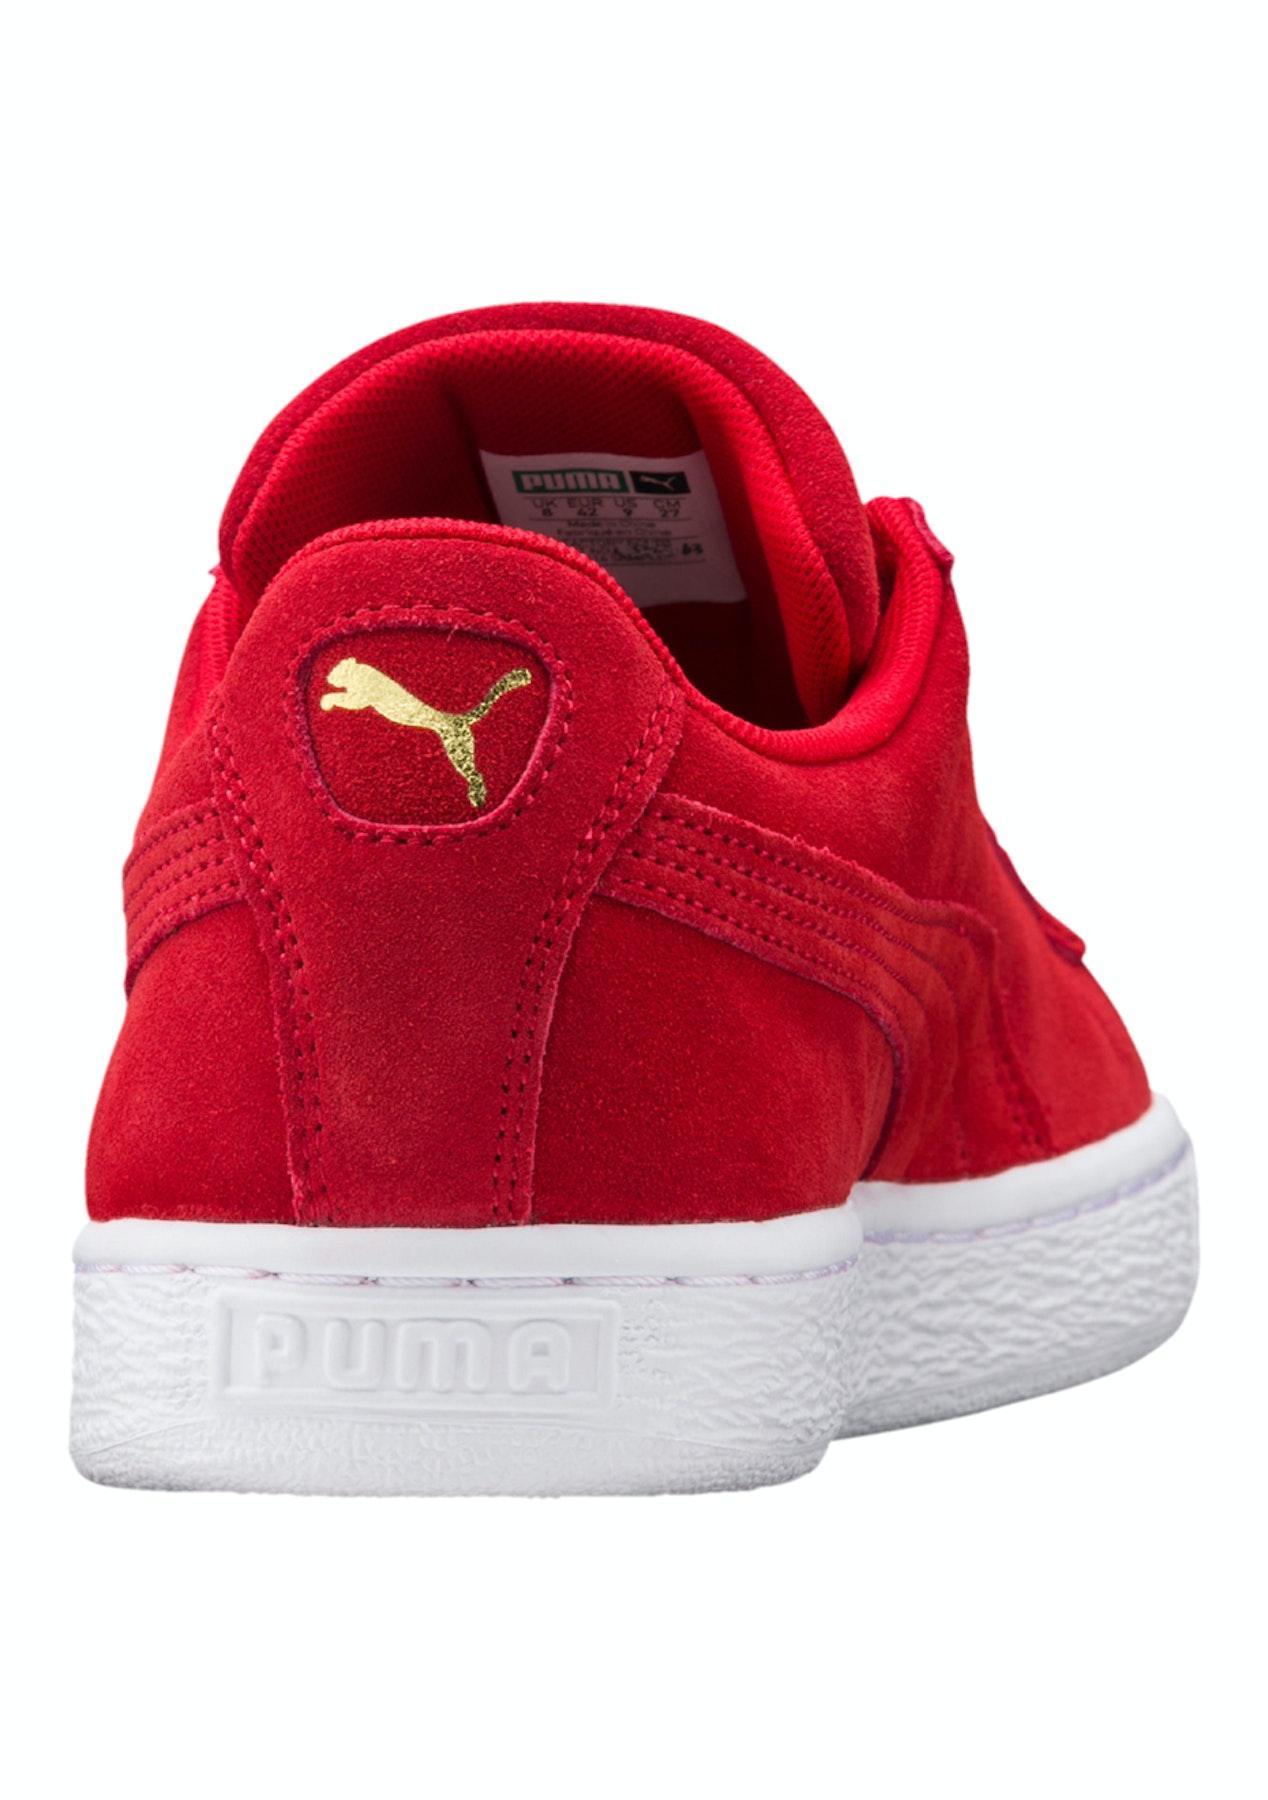 pretty nice 373fa 3ff40 Puma - Suede Classic + High Risk Red - Womens